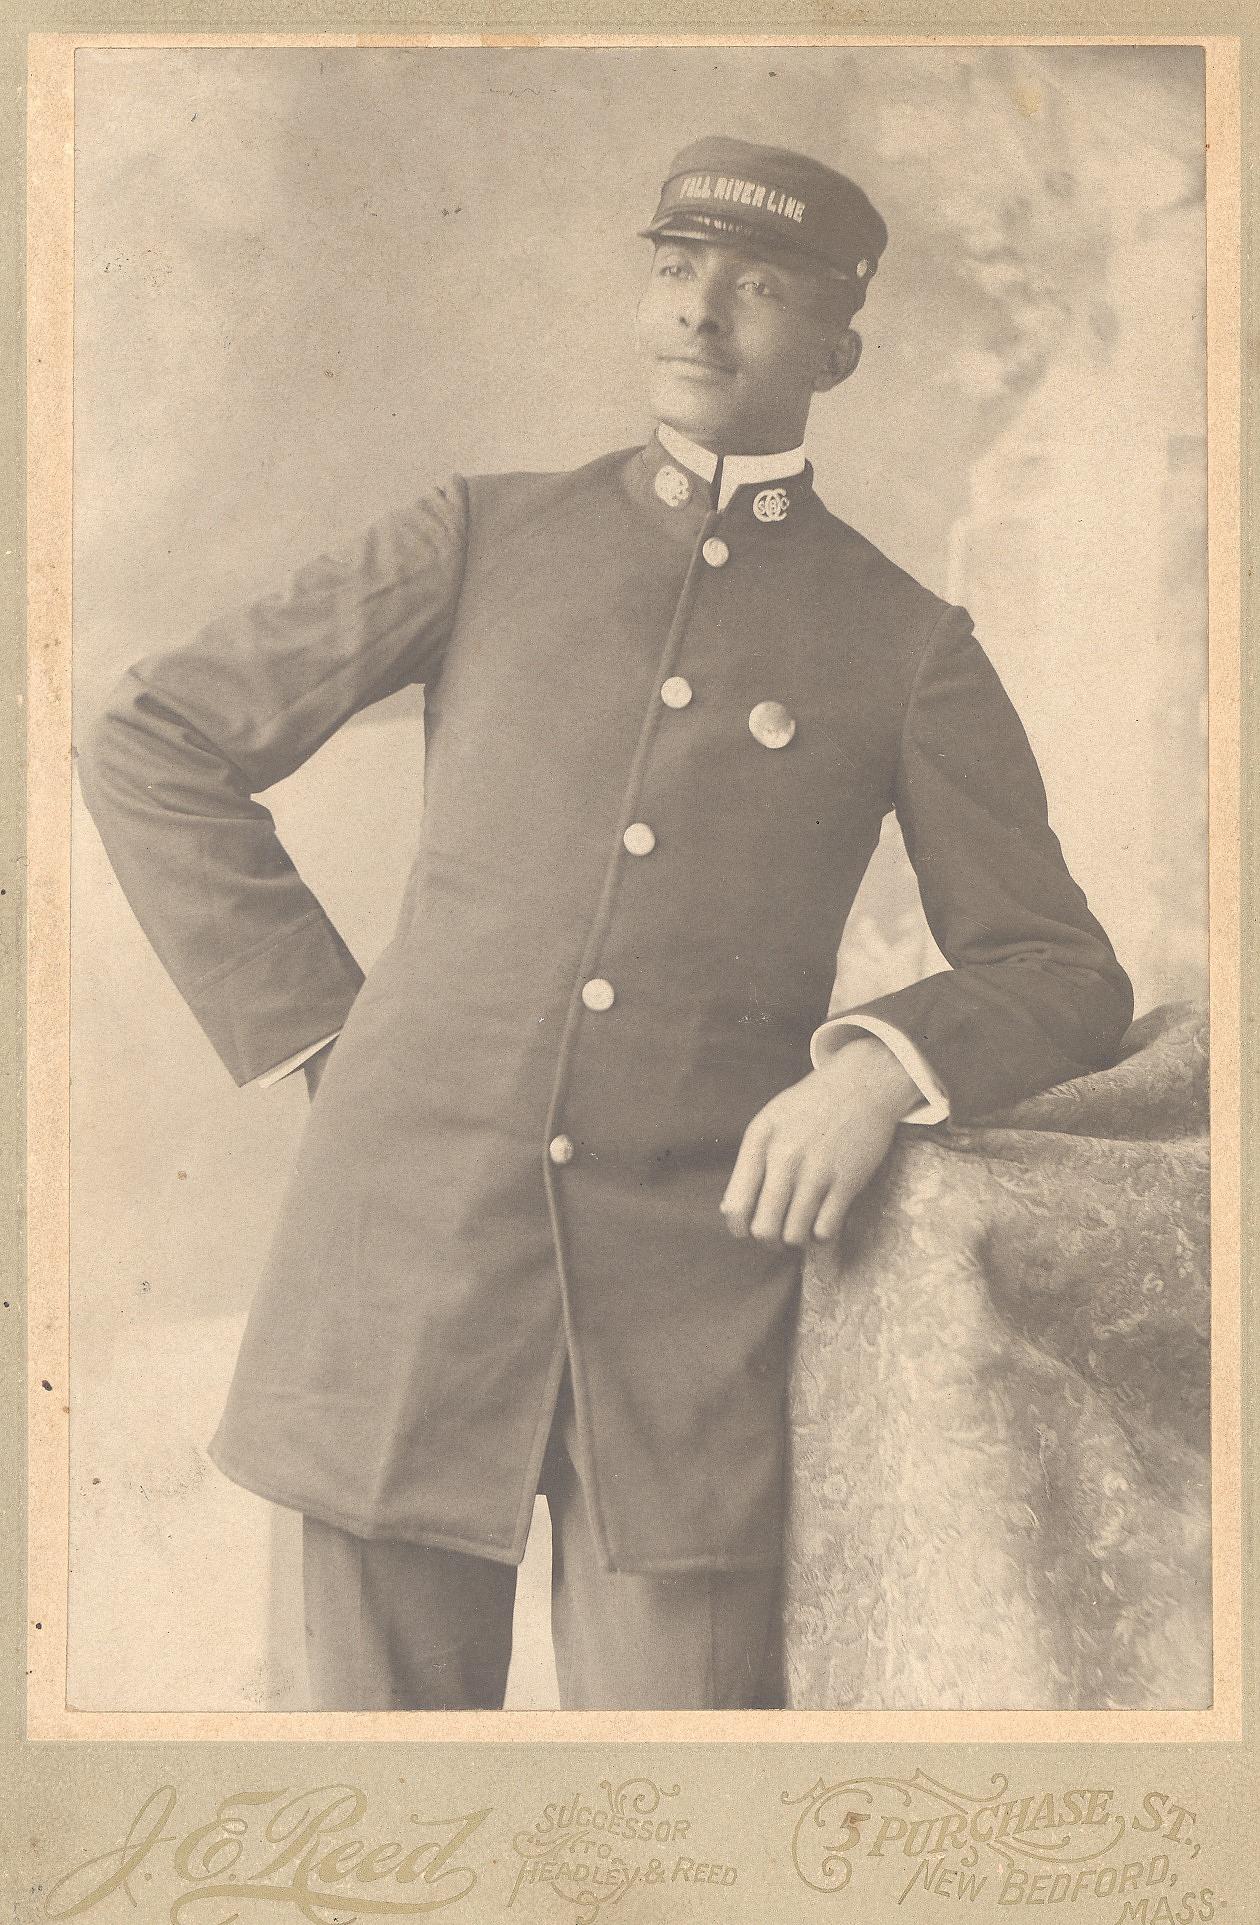 images for Portrait of John Reid wearing Pullman porters uniform